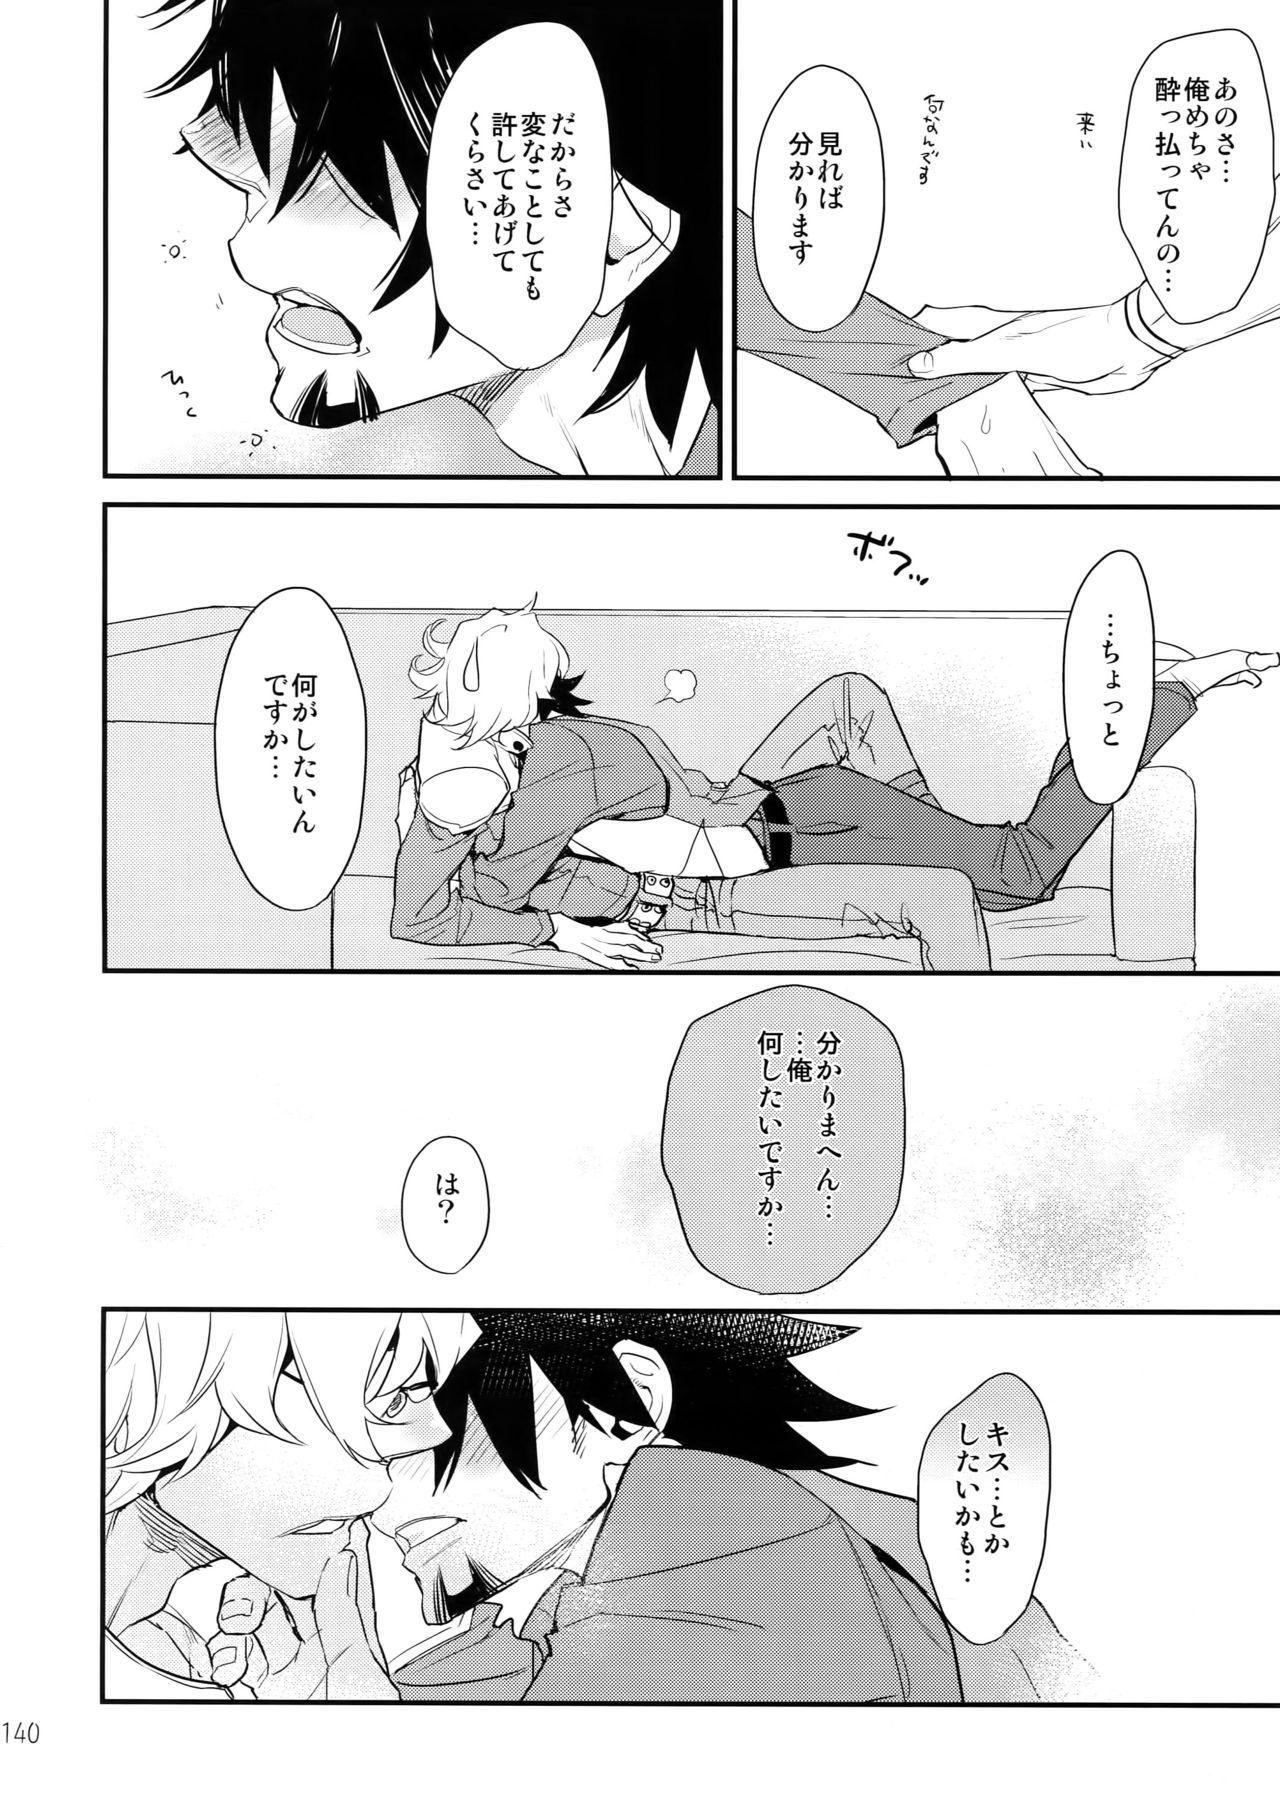 T&B Sairoku! 2 138